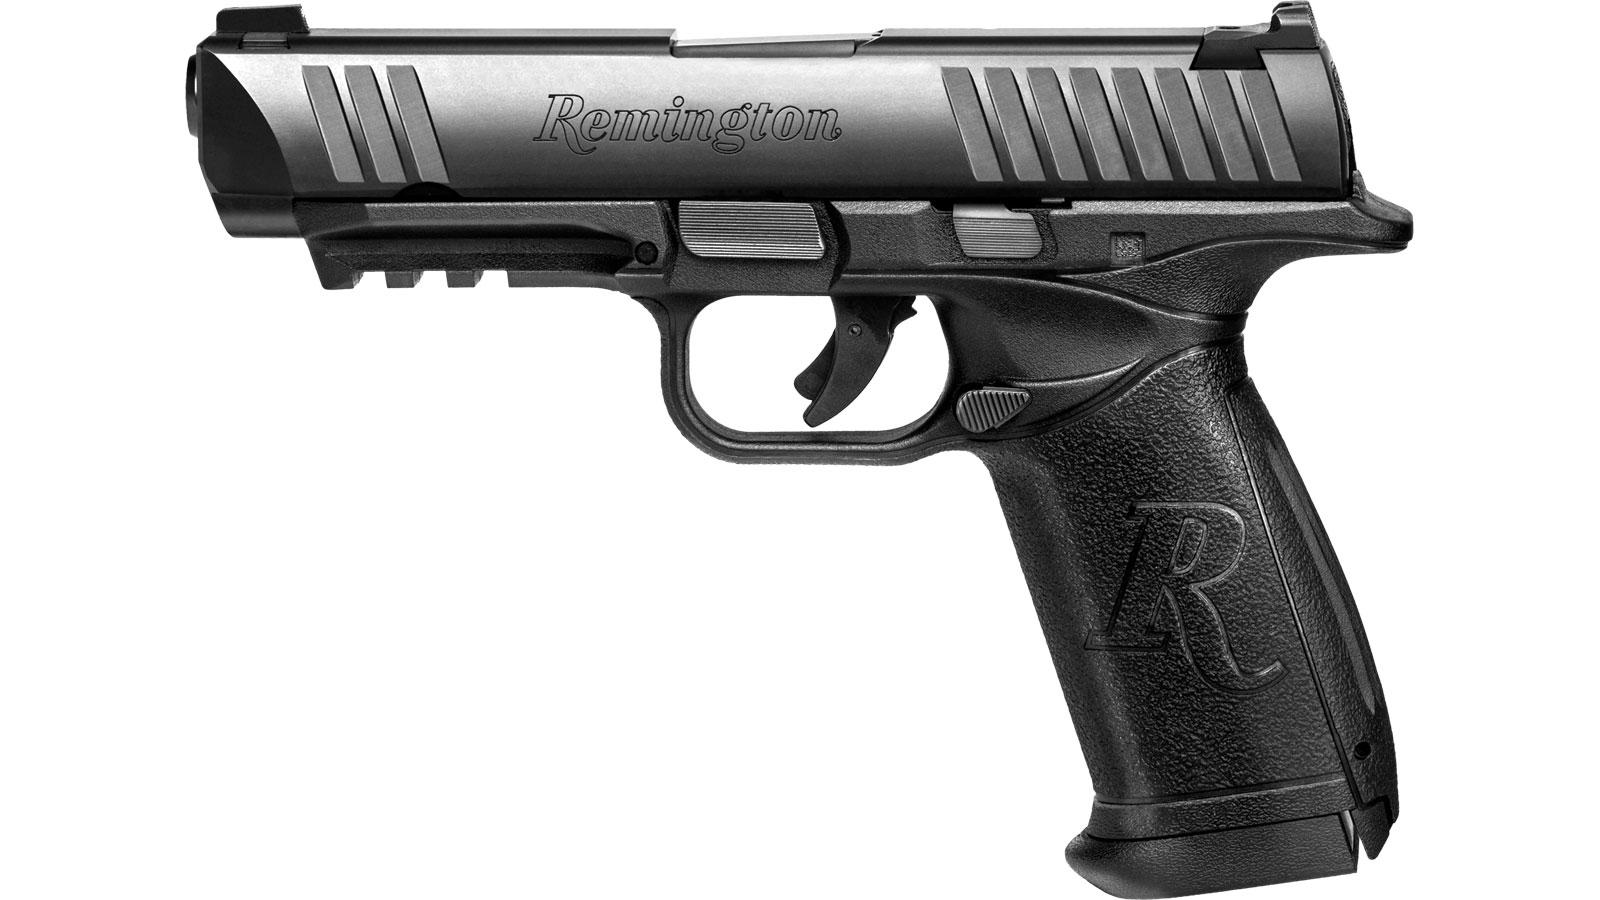 Remington Firearms 96476 RP9 Single|Double 9mm 4.5 10+1 Black Polymer Grip Black in.